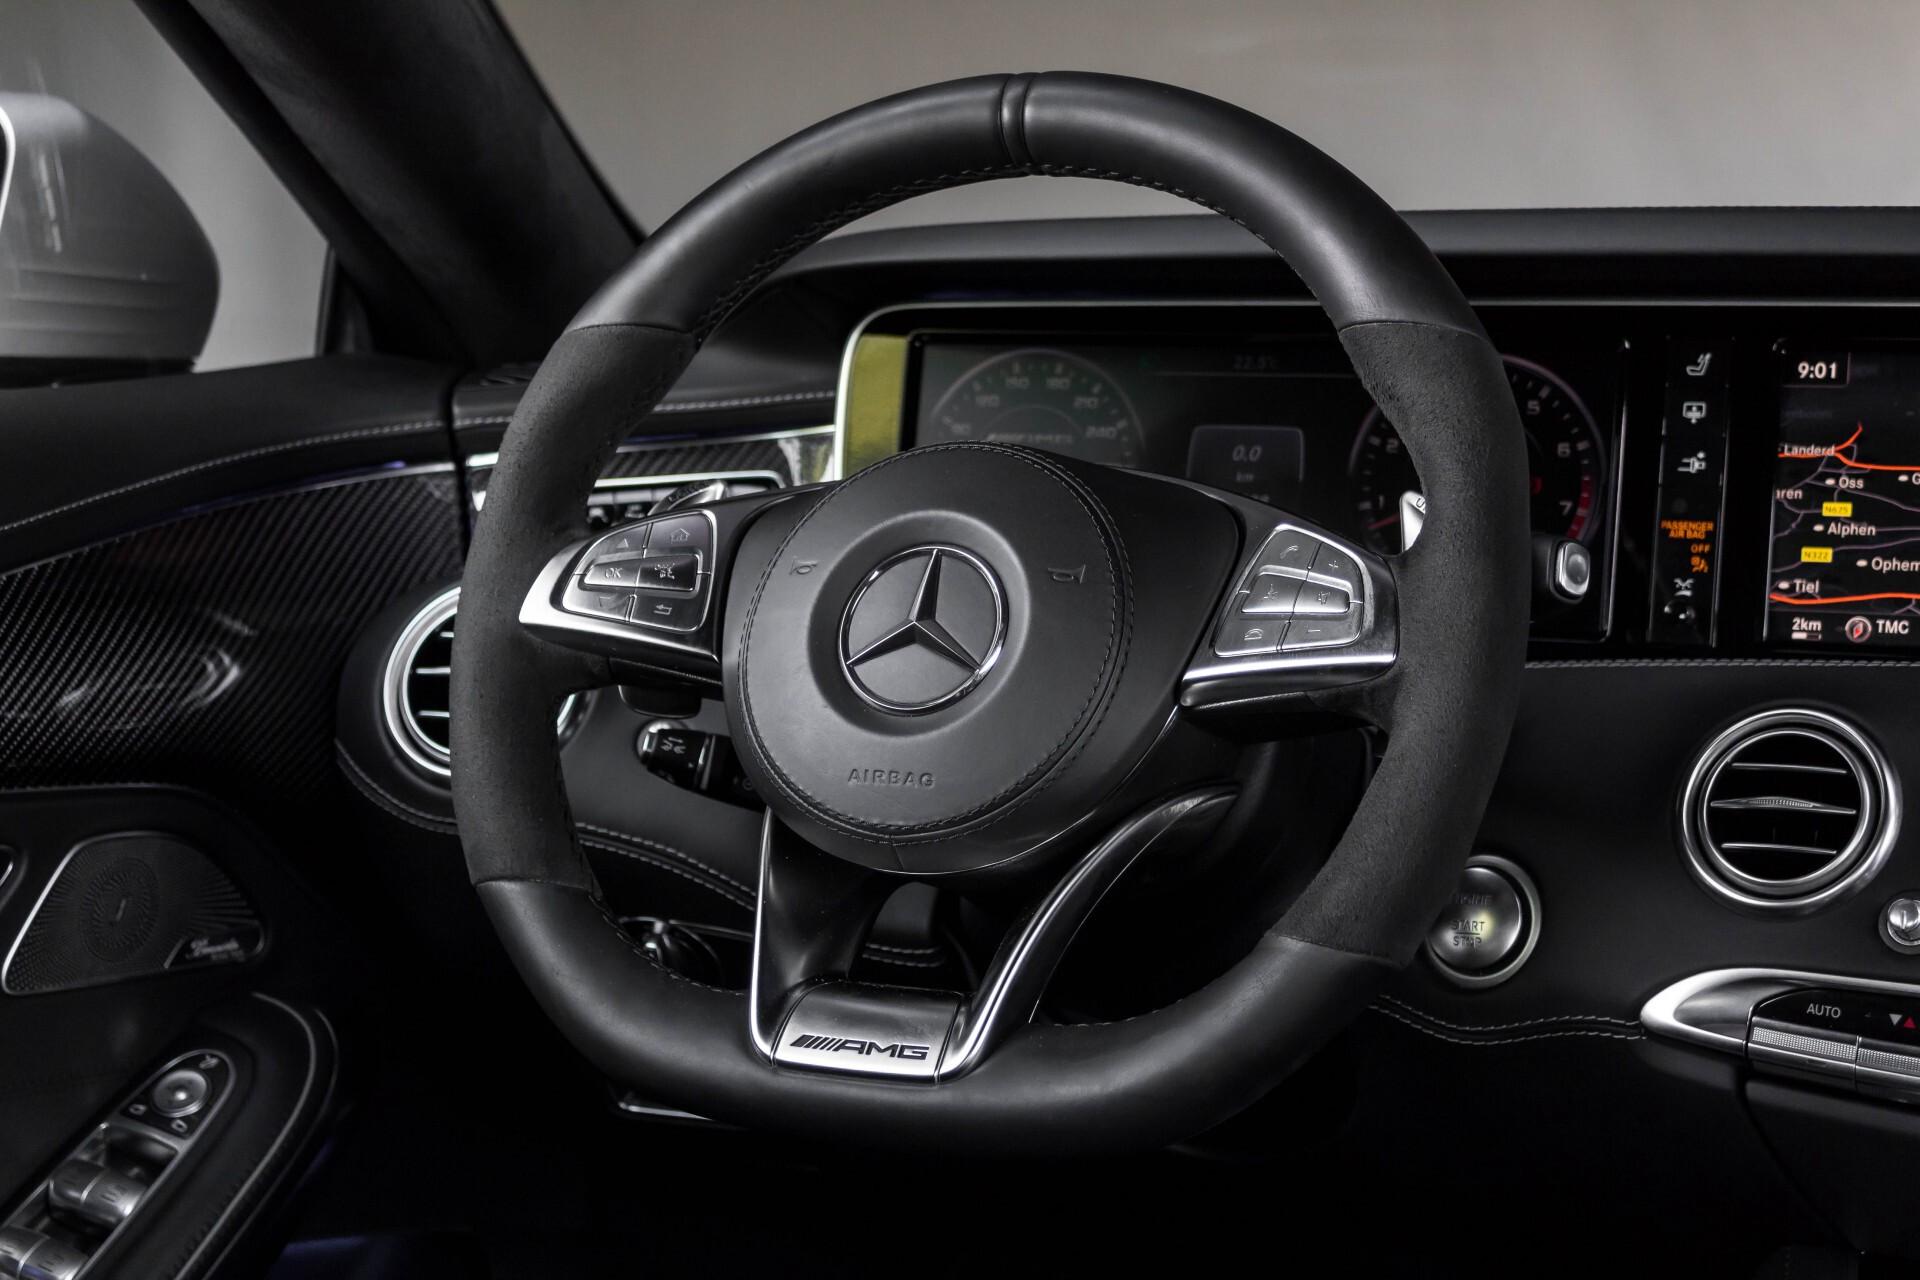 Mercedes-Benz S-Klasse Coupé 63 AMG 4-M Keramisch/Akrapovic/Swarowski/Designo/Burmester High End Aut7 Foto 8